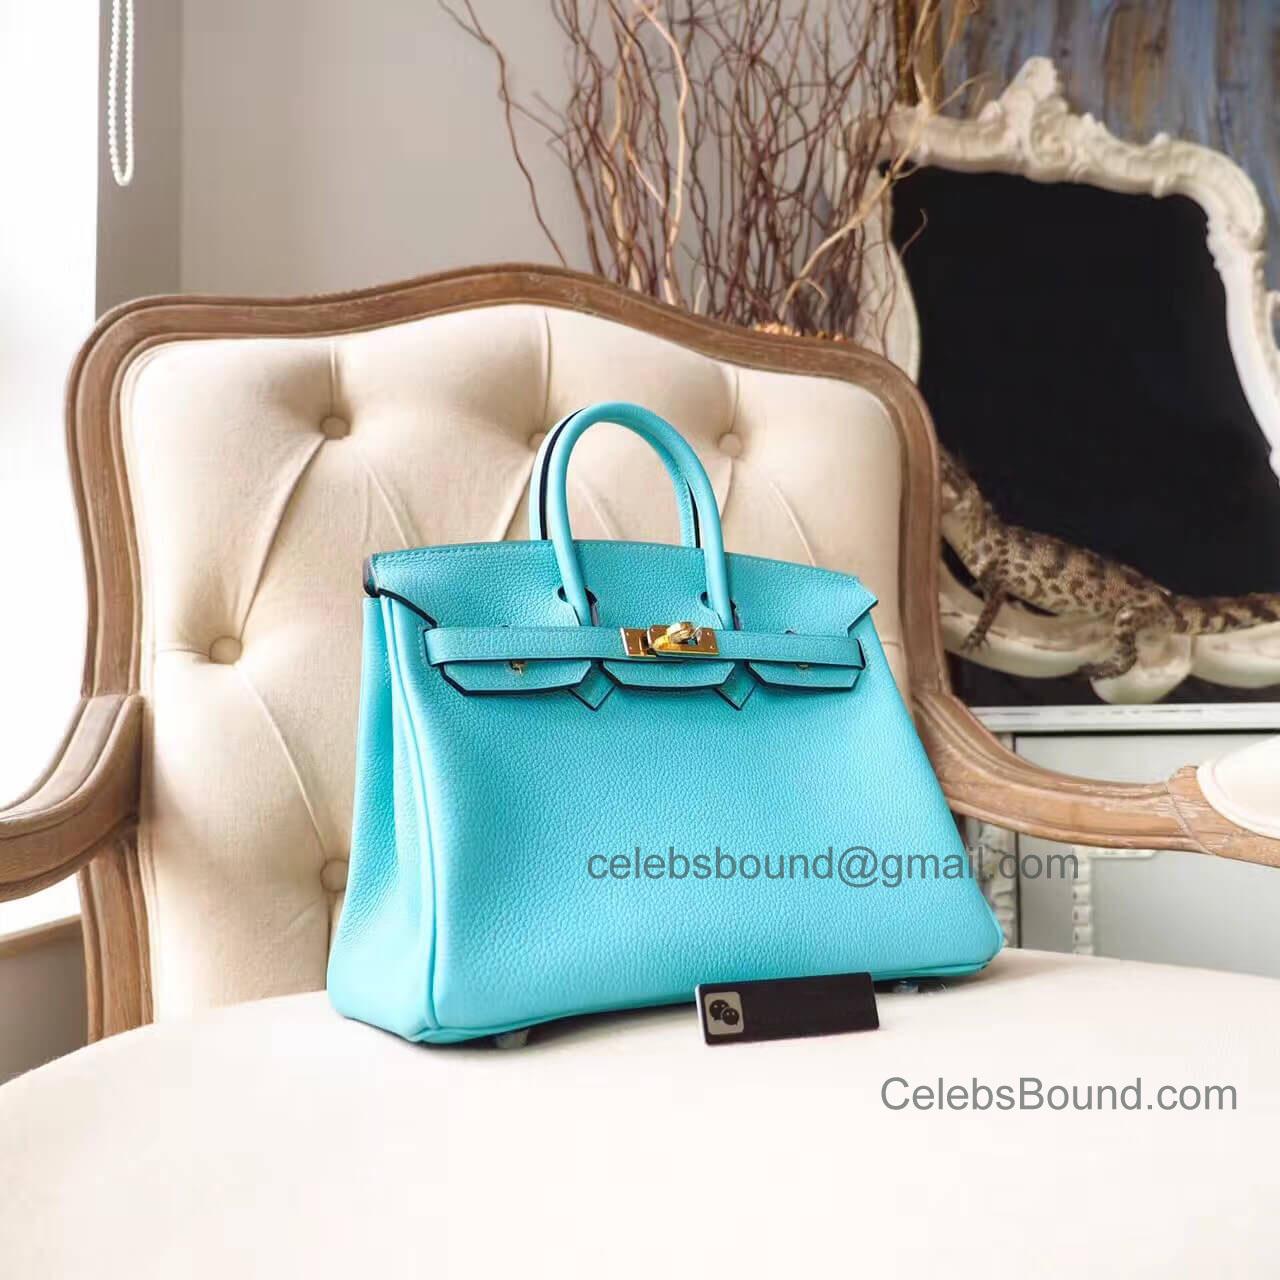 c4290ee15b Hermes Birkin 25 Bag in 3p Blue Atoll Togo GHW